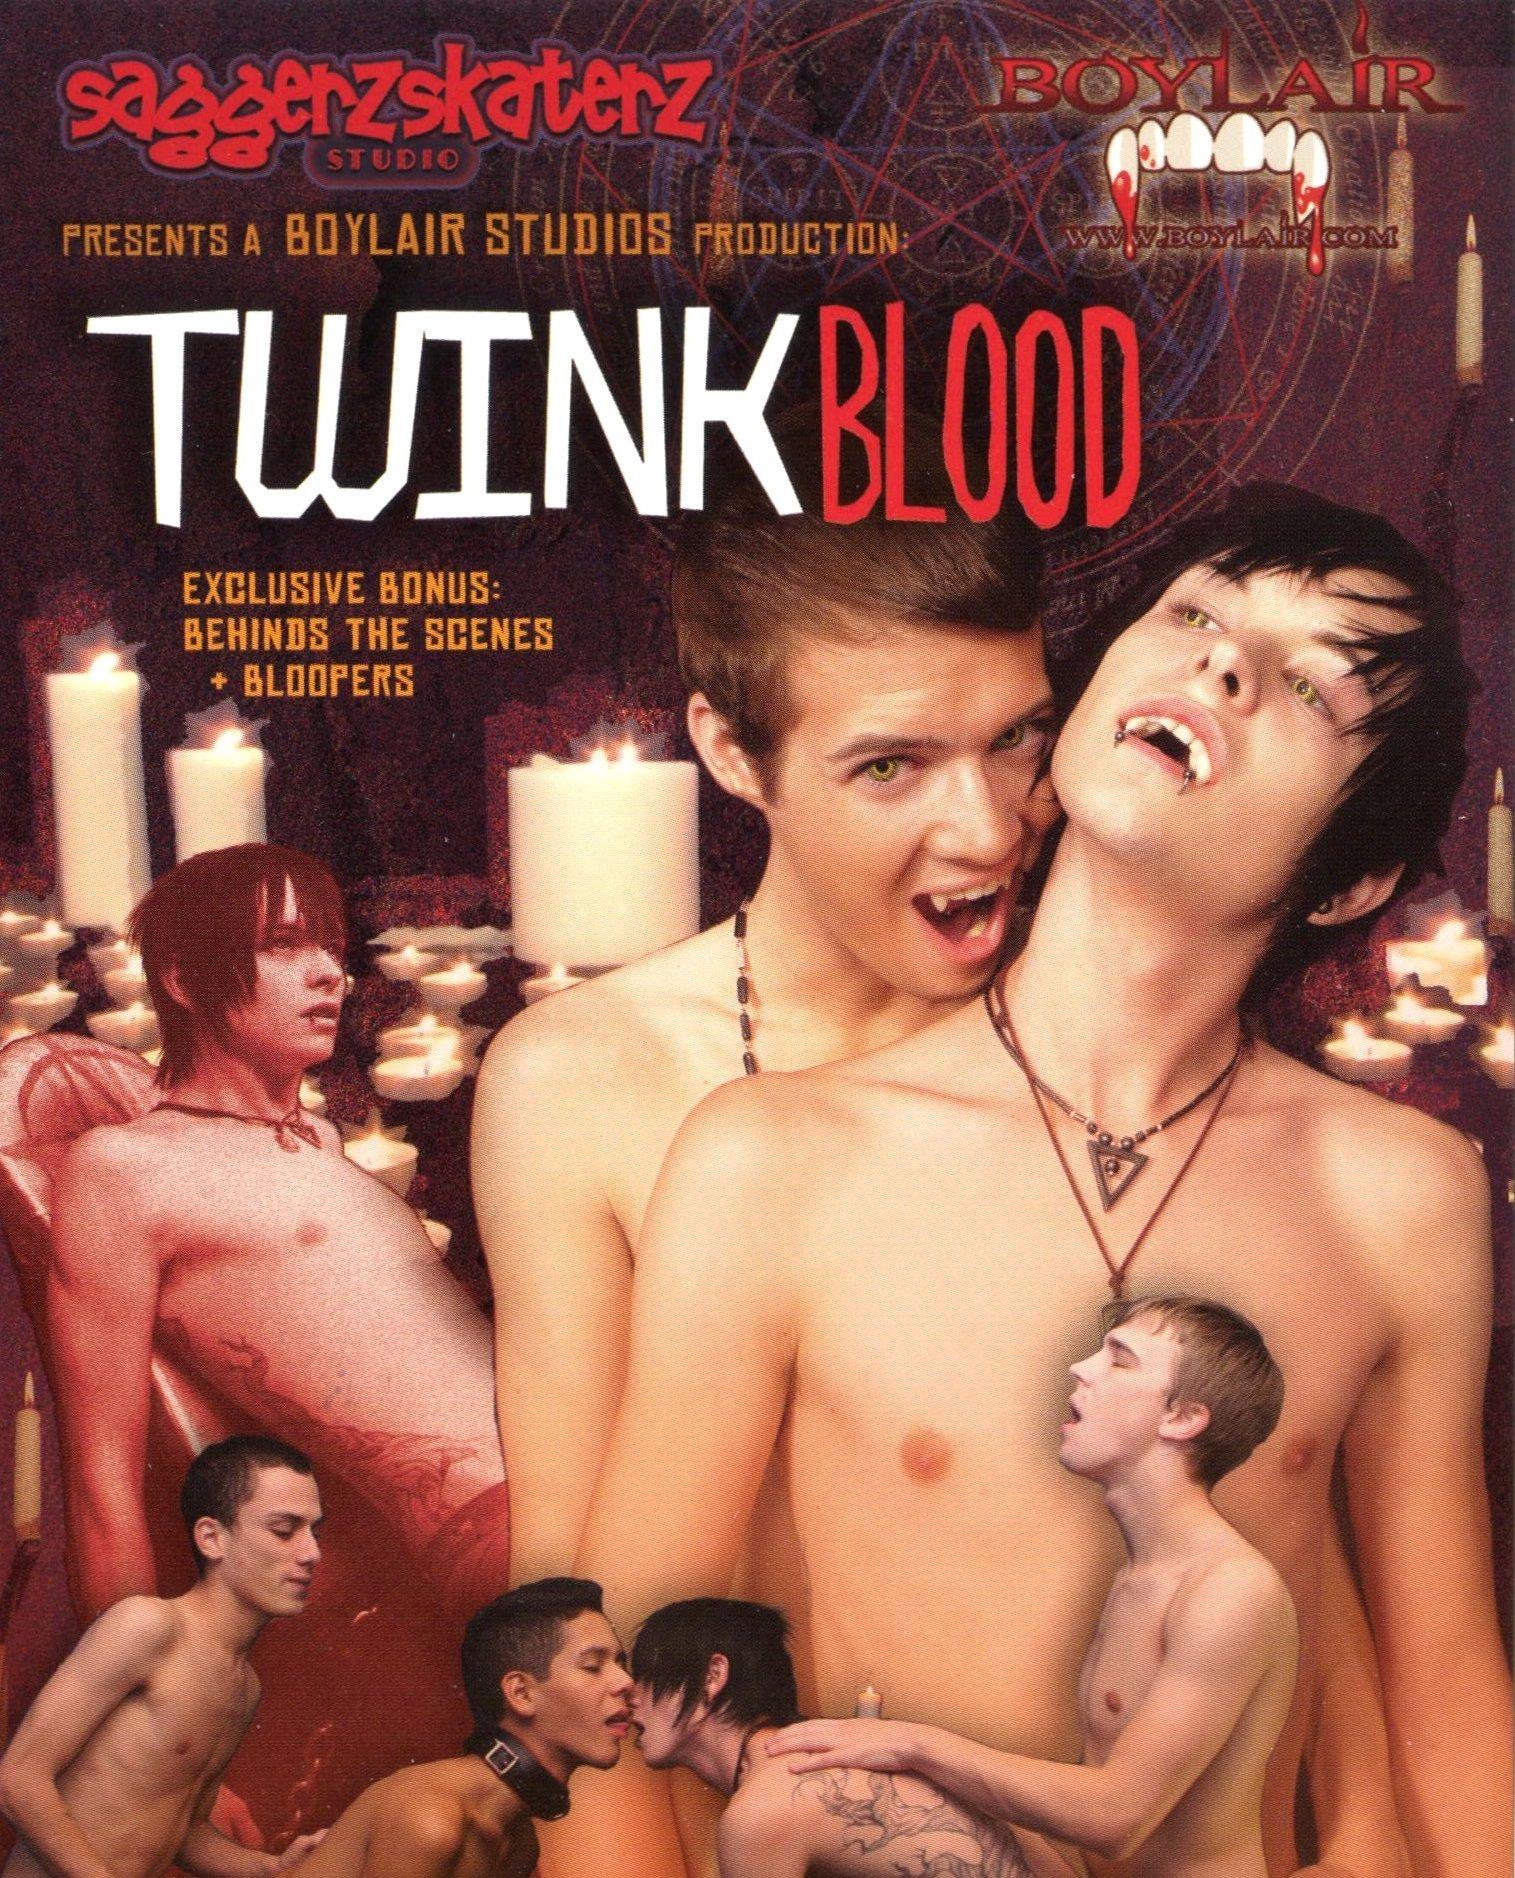 Vampire outdoor gay movie real redhot gay 8